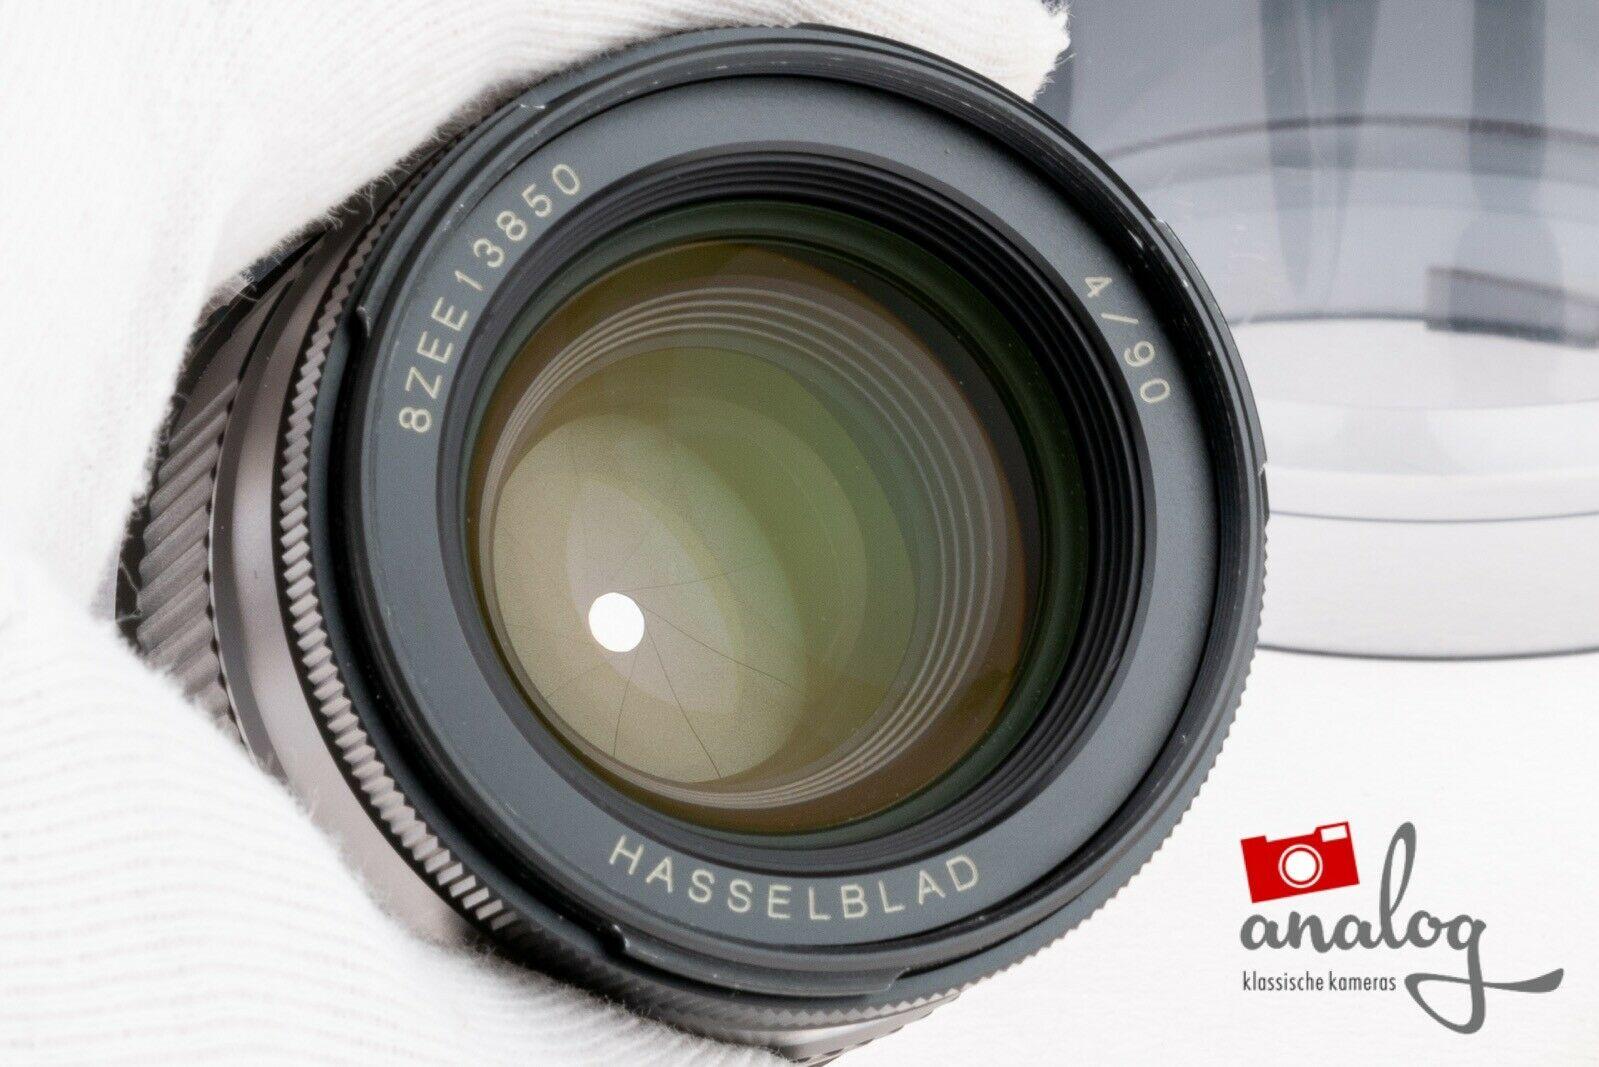 Hasselblad XPan 90mm 4.0